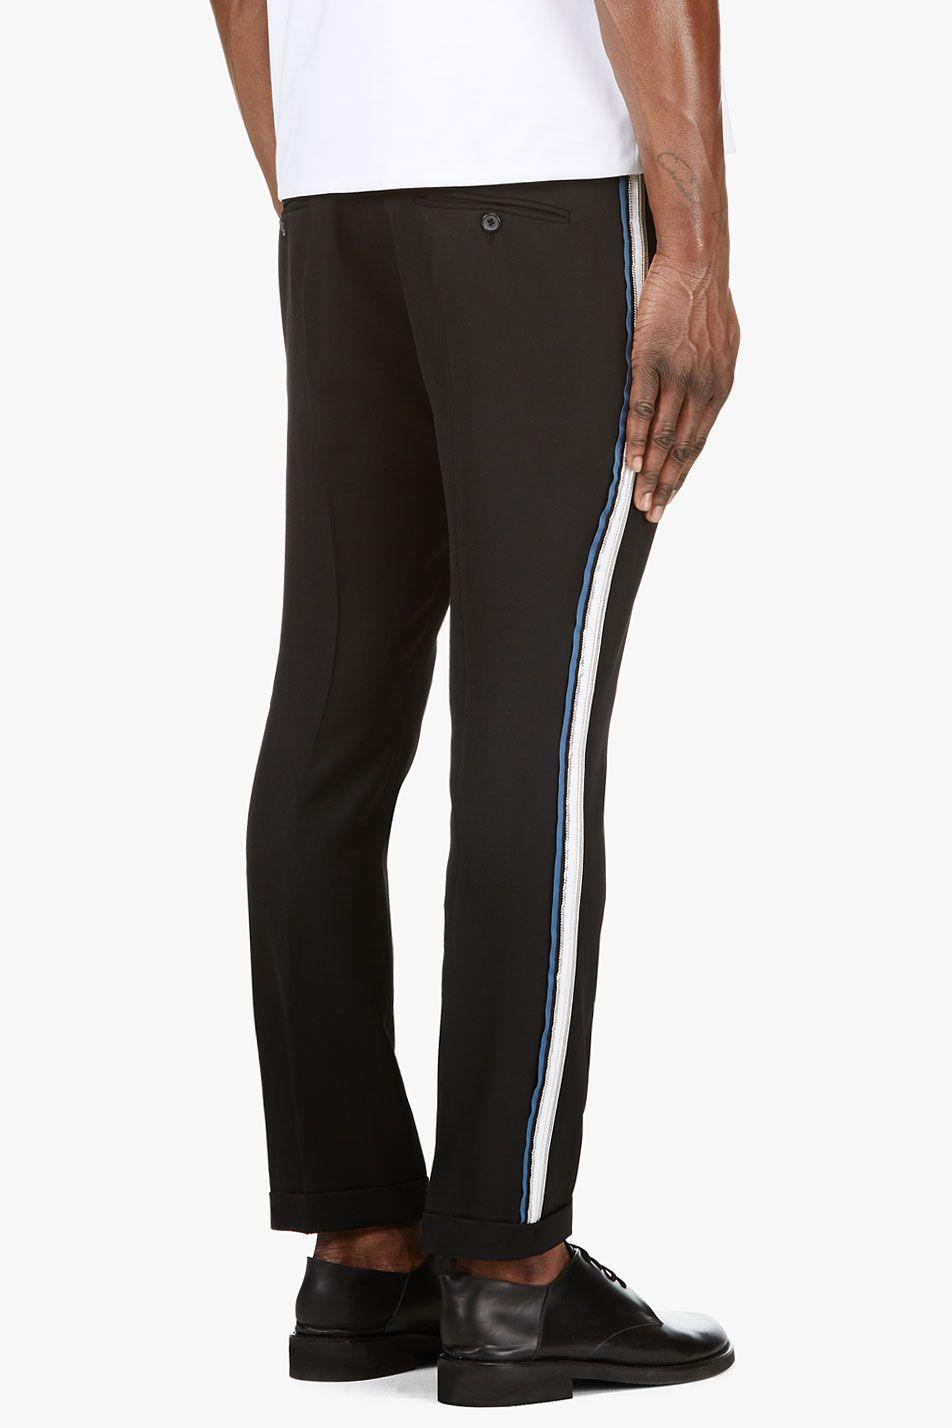 Balmain Black Slim Side Stripe Fit Trousers Mens Outfits